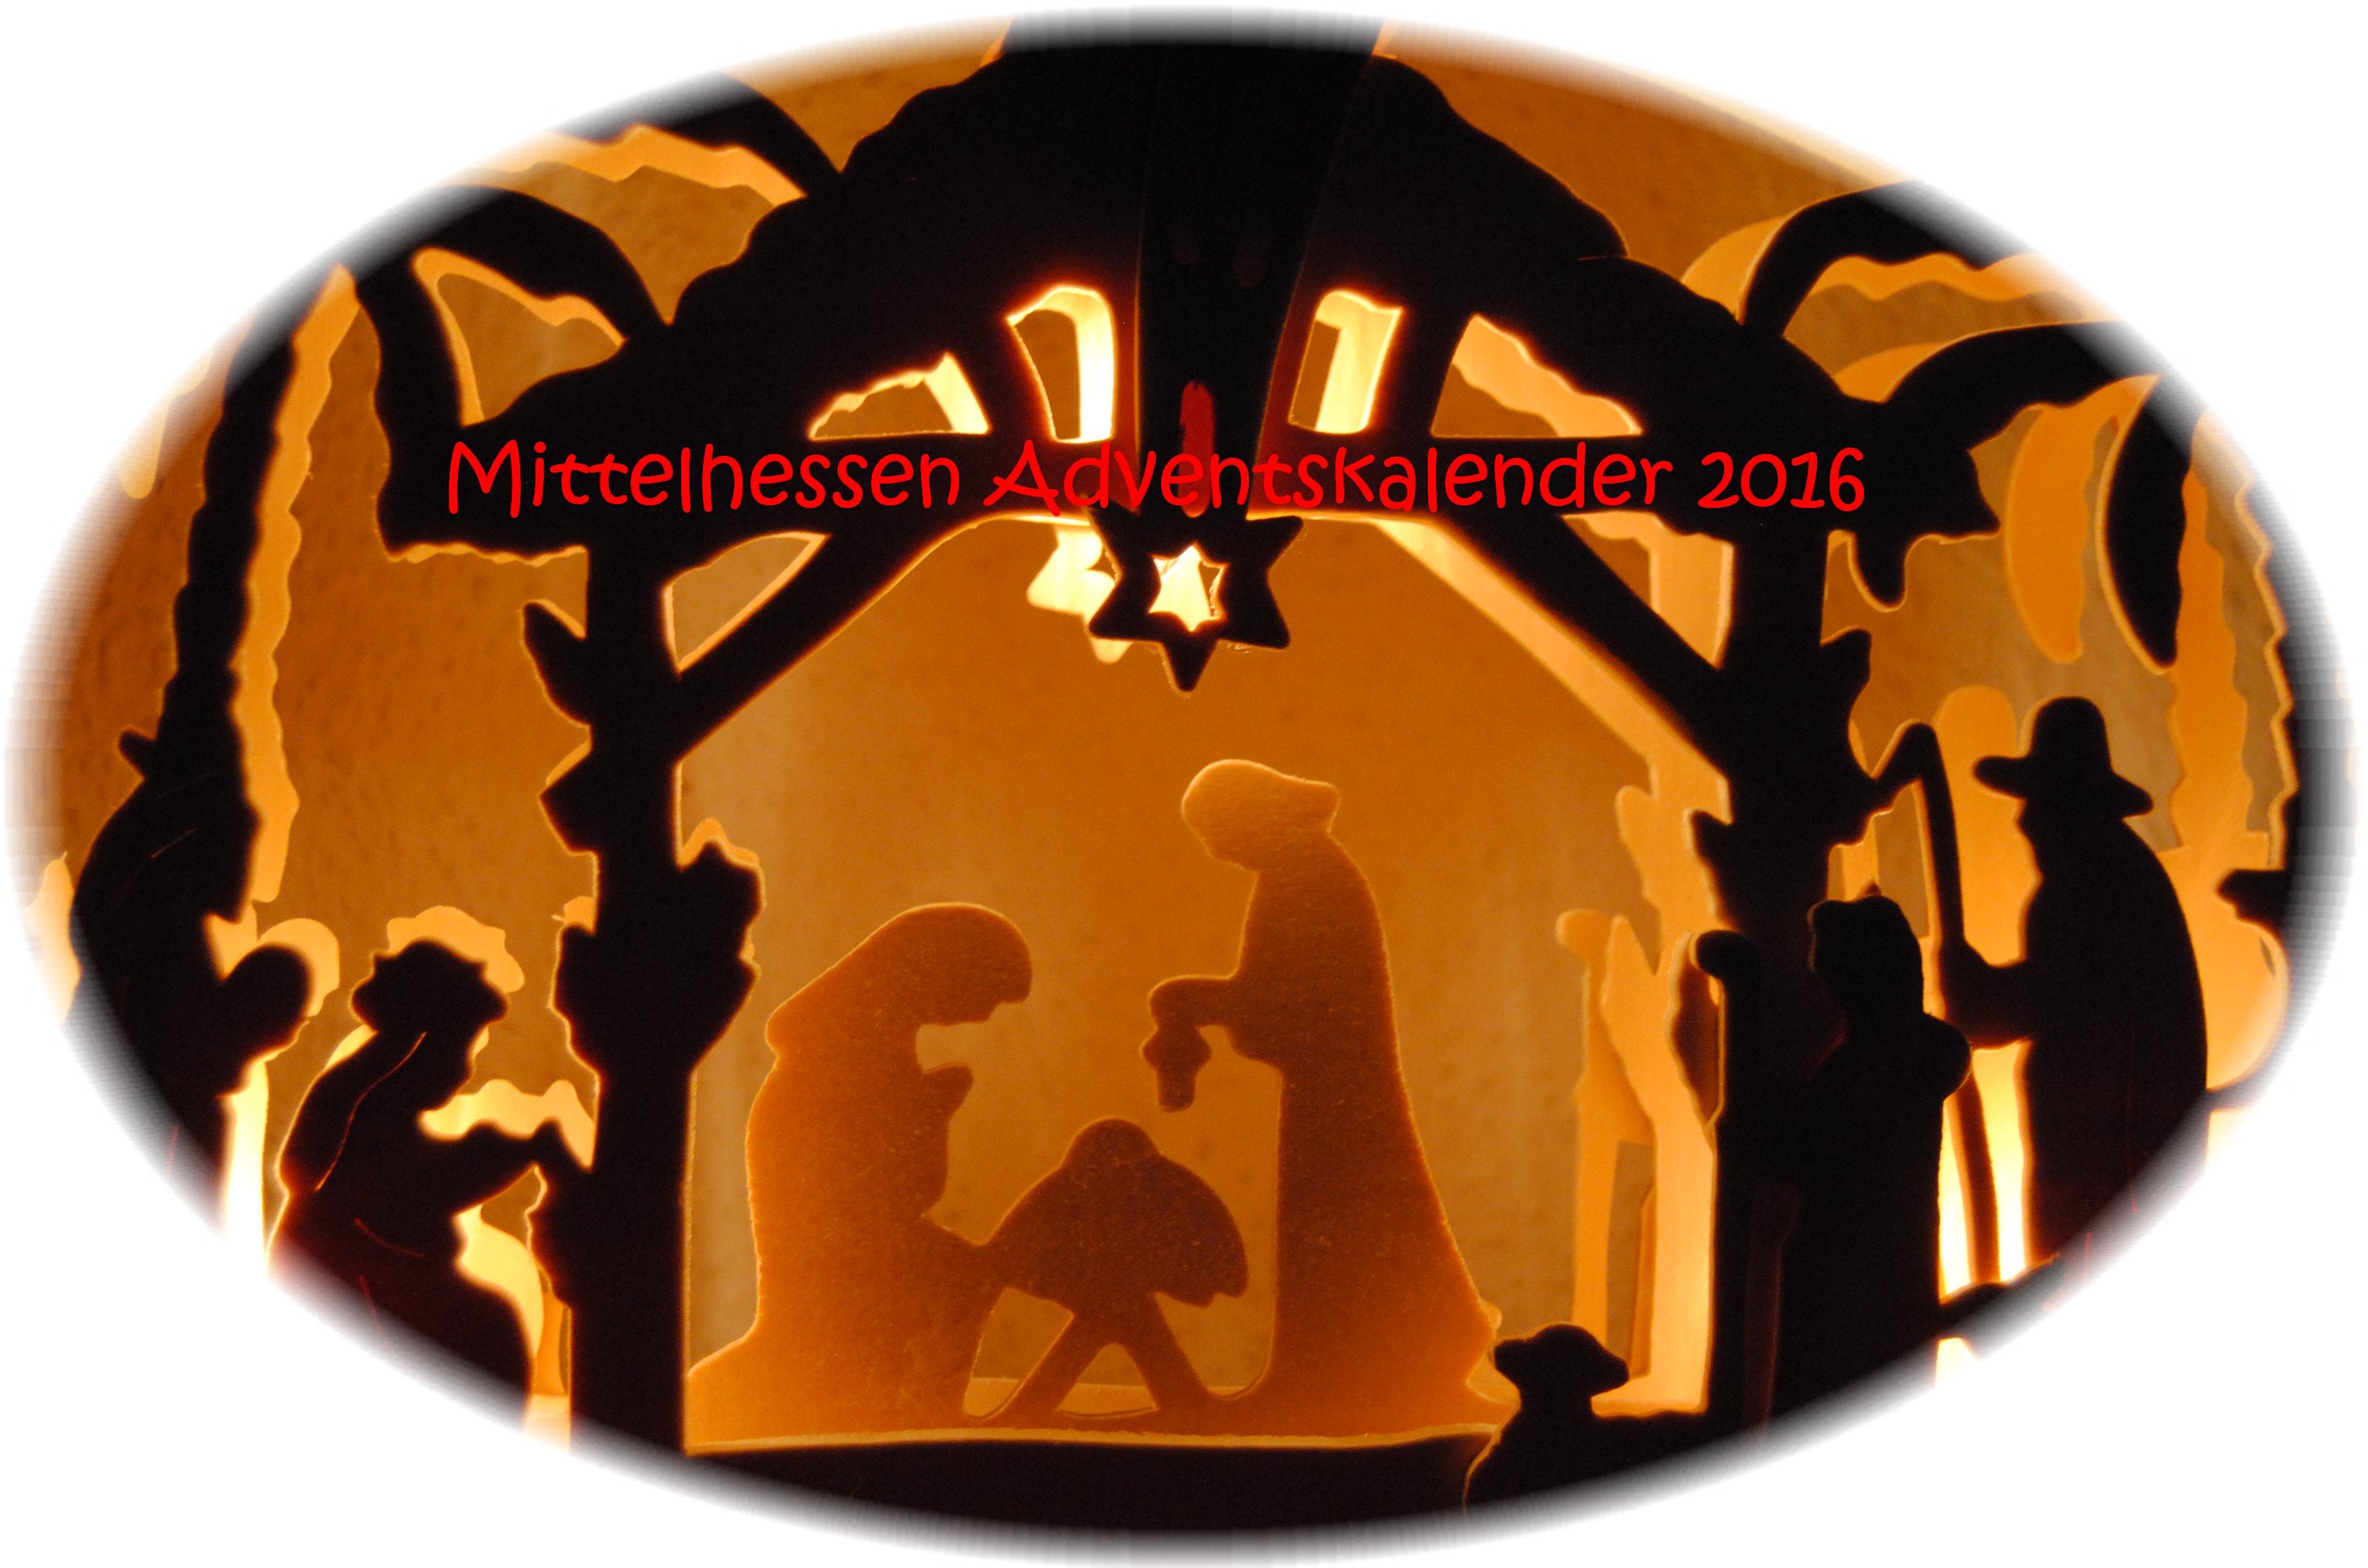 gc6t61x 17 t rchen 2016 oh tannenbaum wherigo cache in. Black Bedroom Furniture Sets. Home Design Ideas